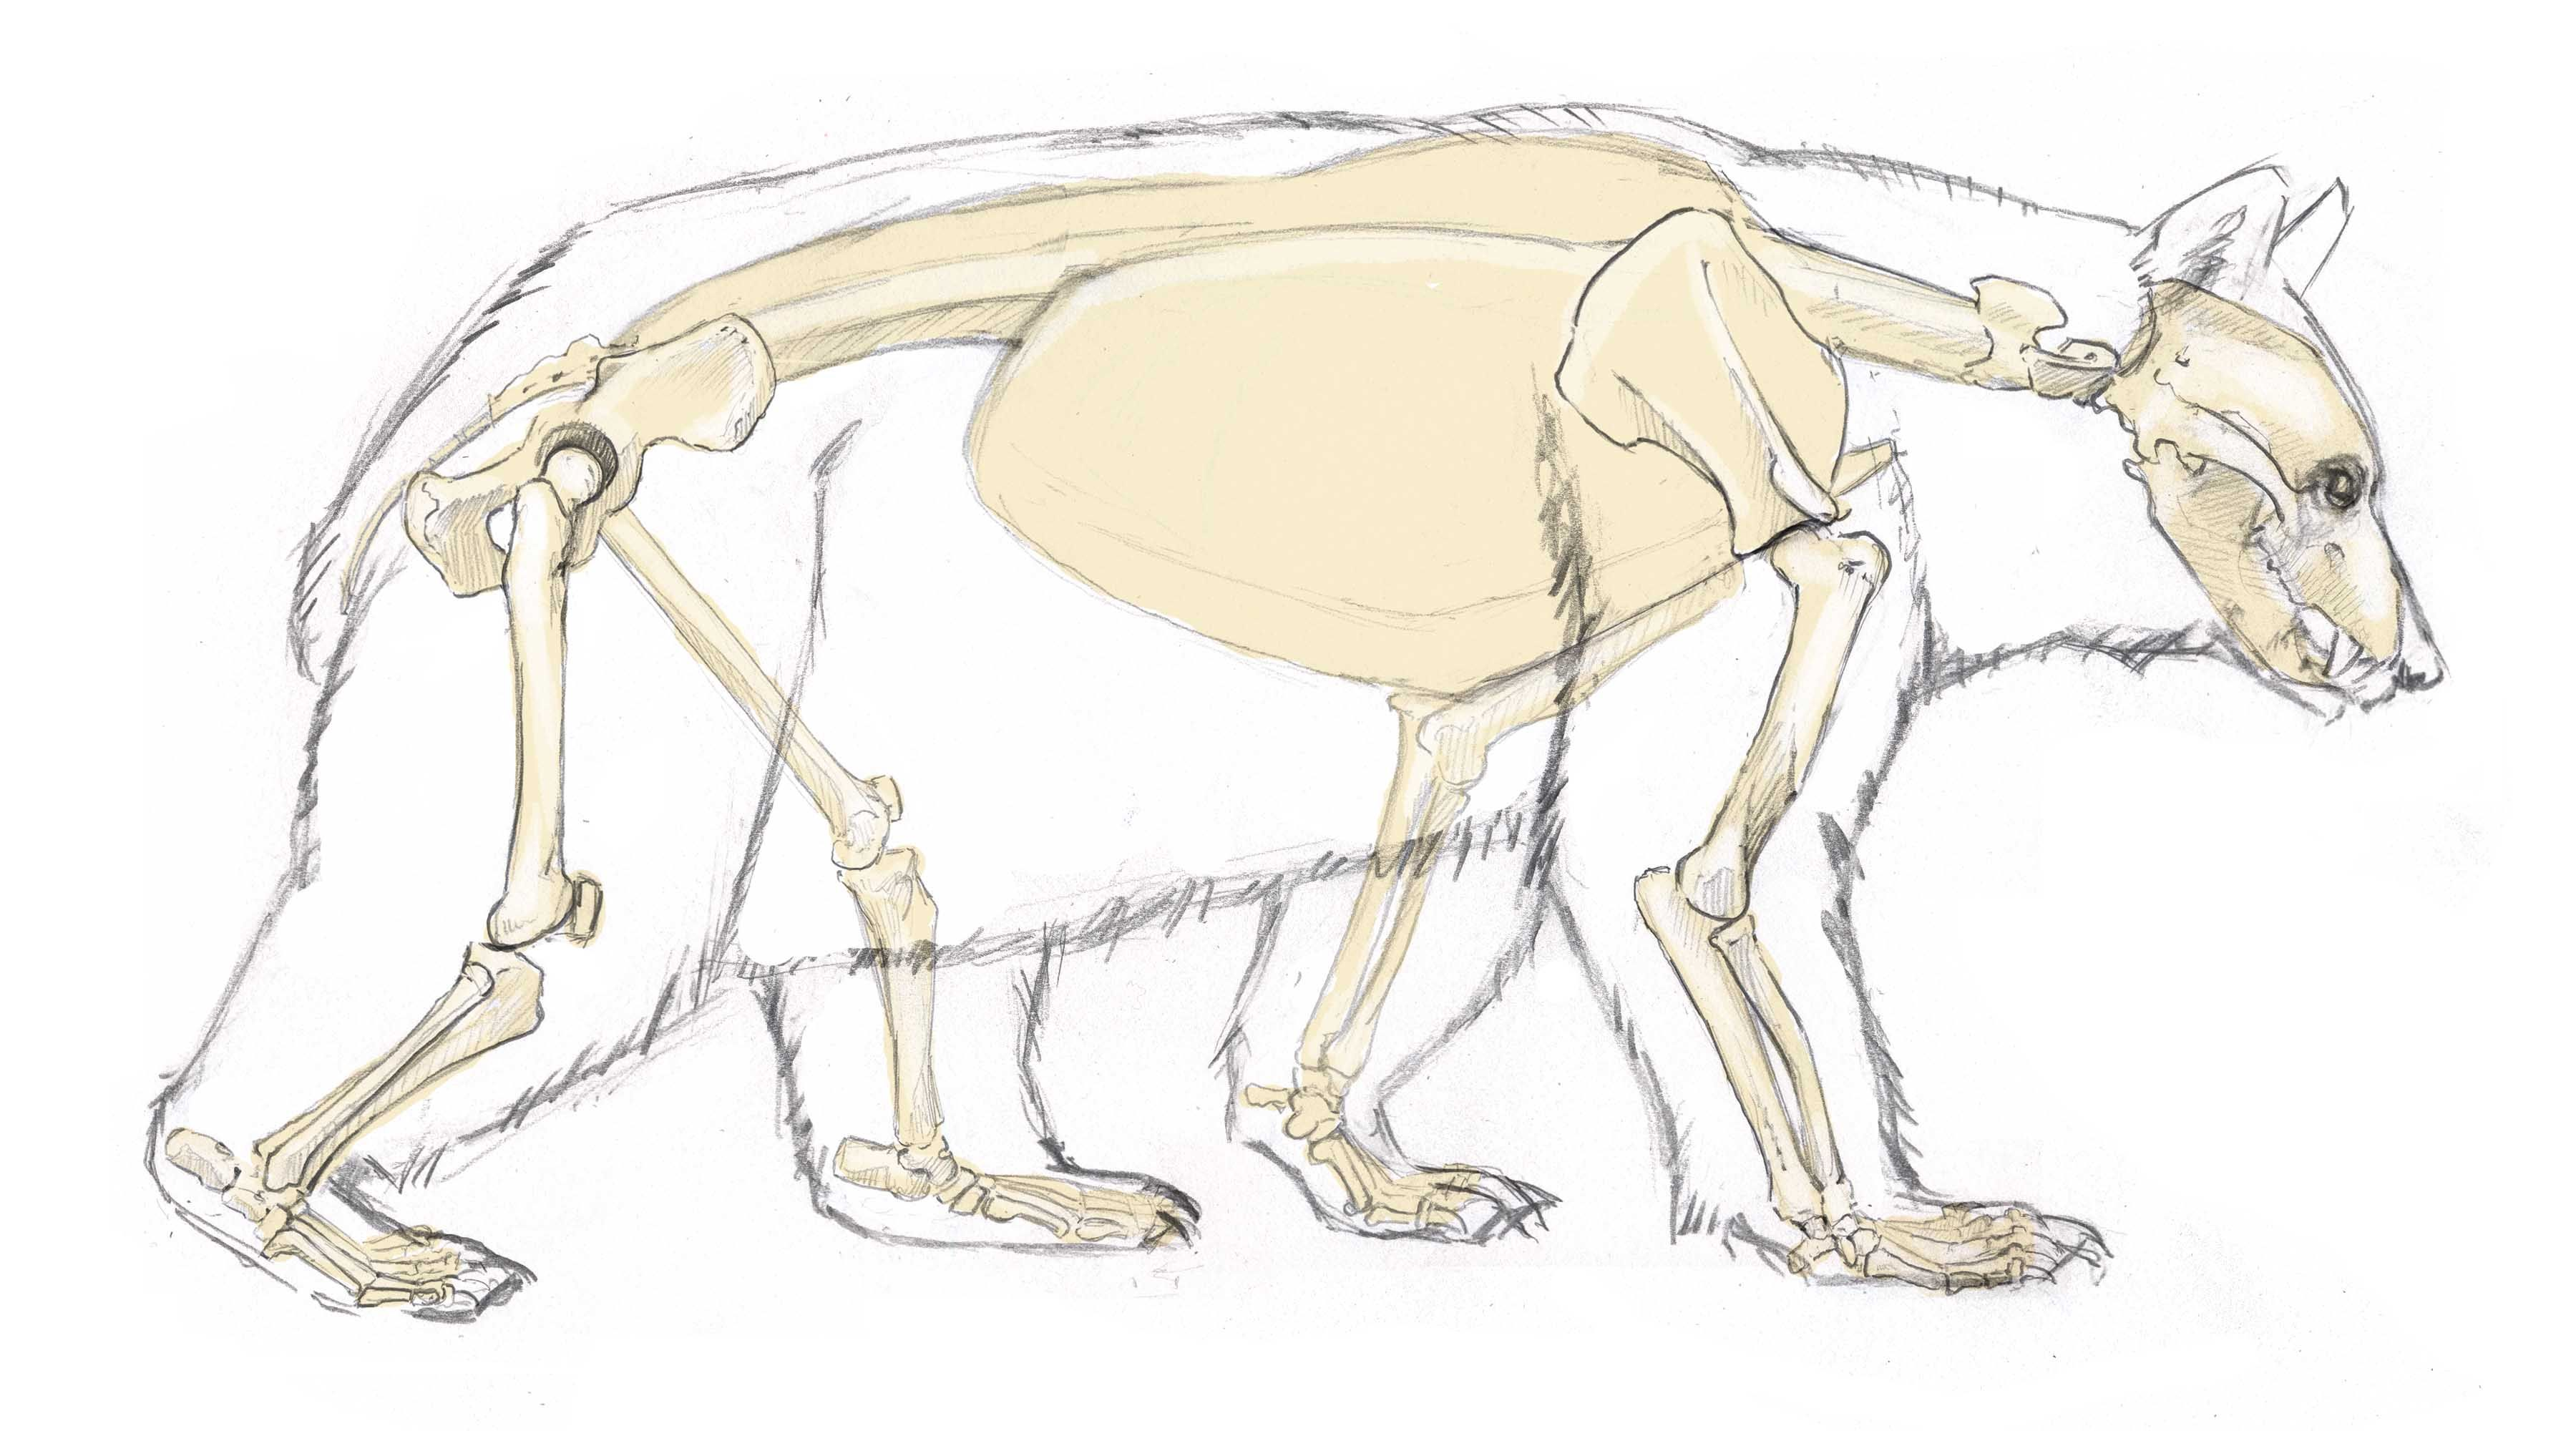 bear anatomy - Google Search | Animals | Pinterest | Anatomy ...